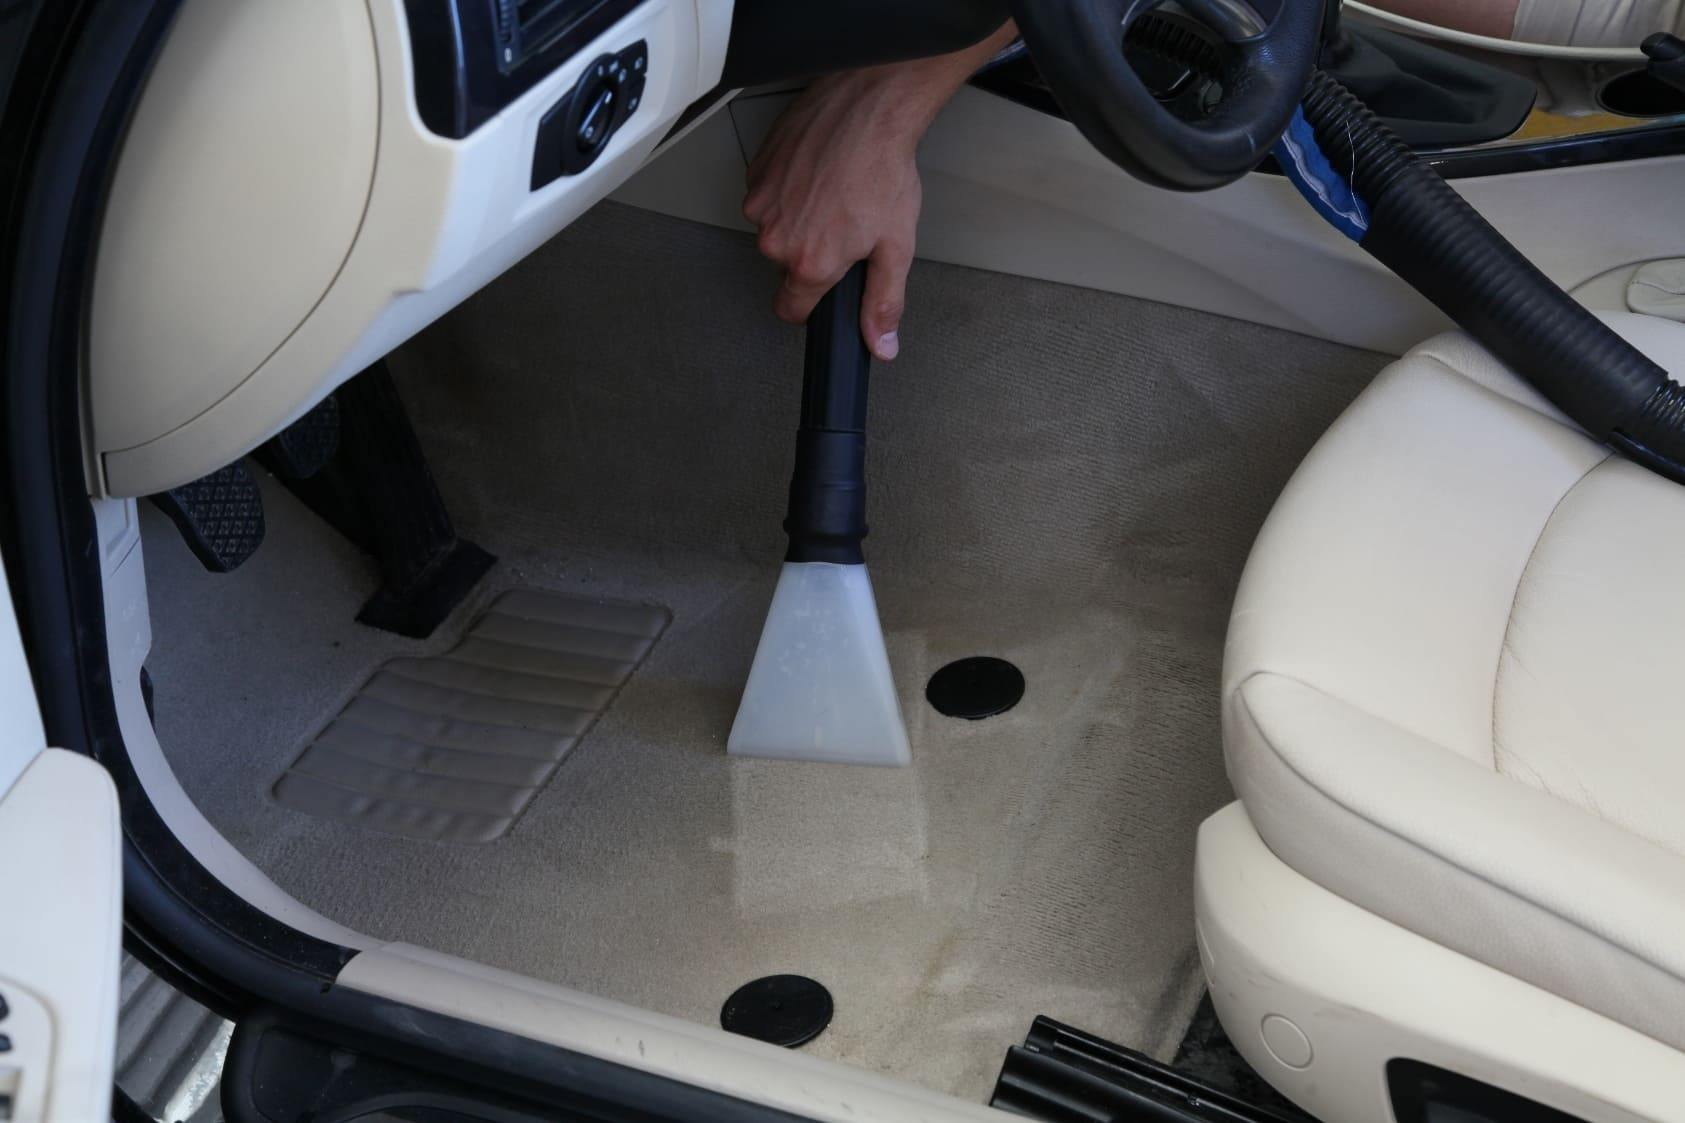 Химчистка авто в тольятти (салона автомобиля) 🚗 цена 3e9ad992419d0